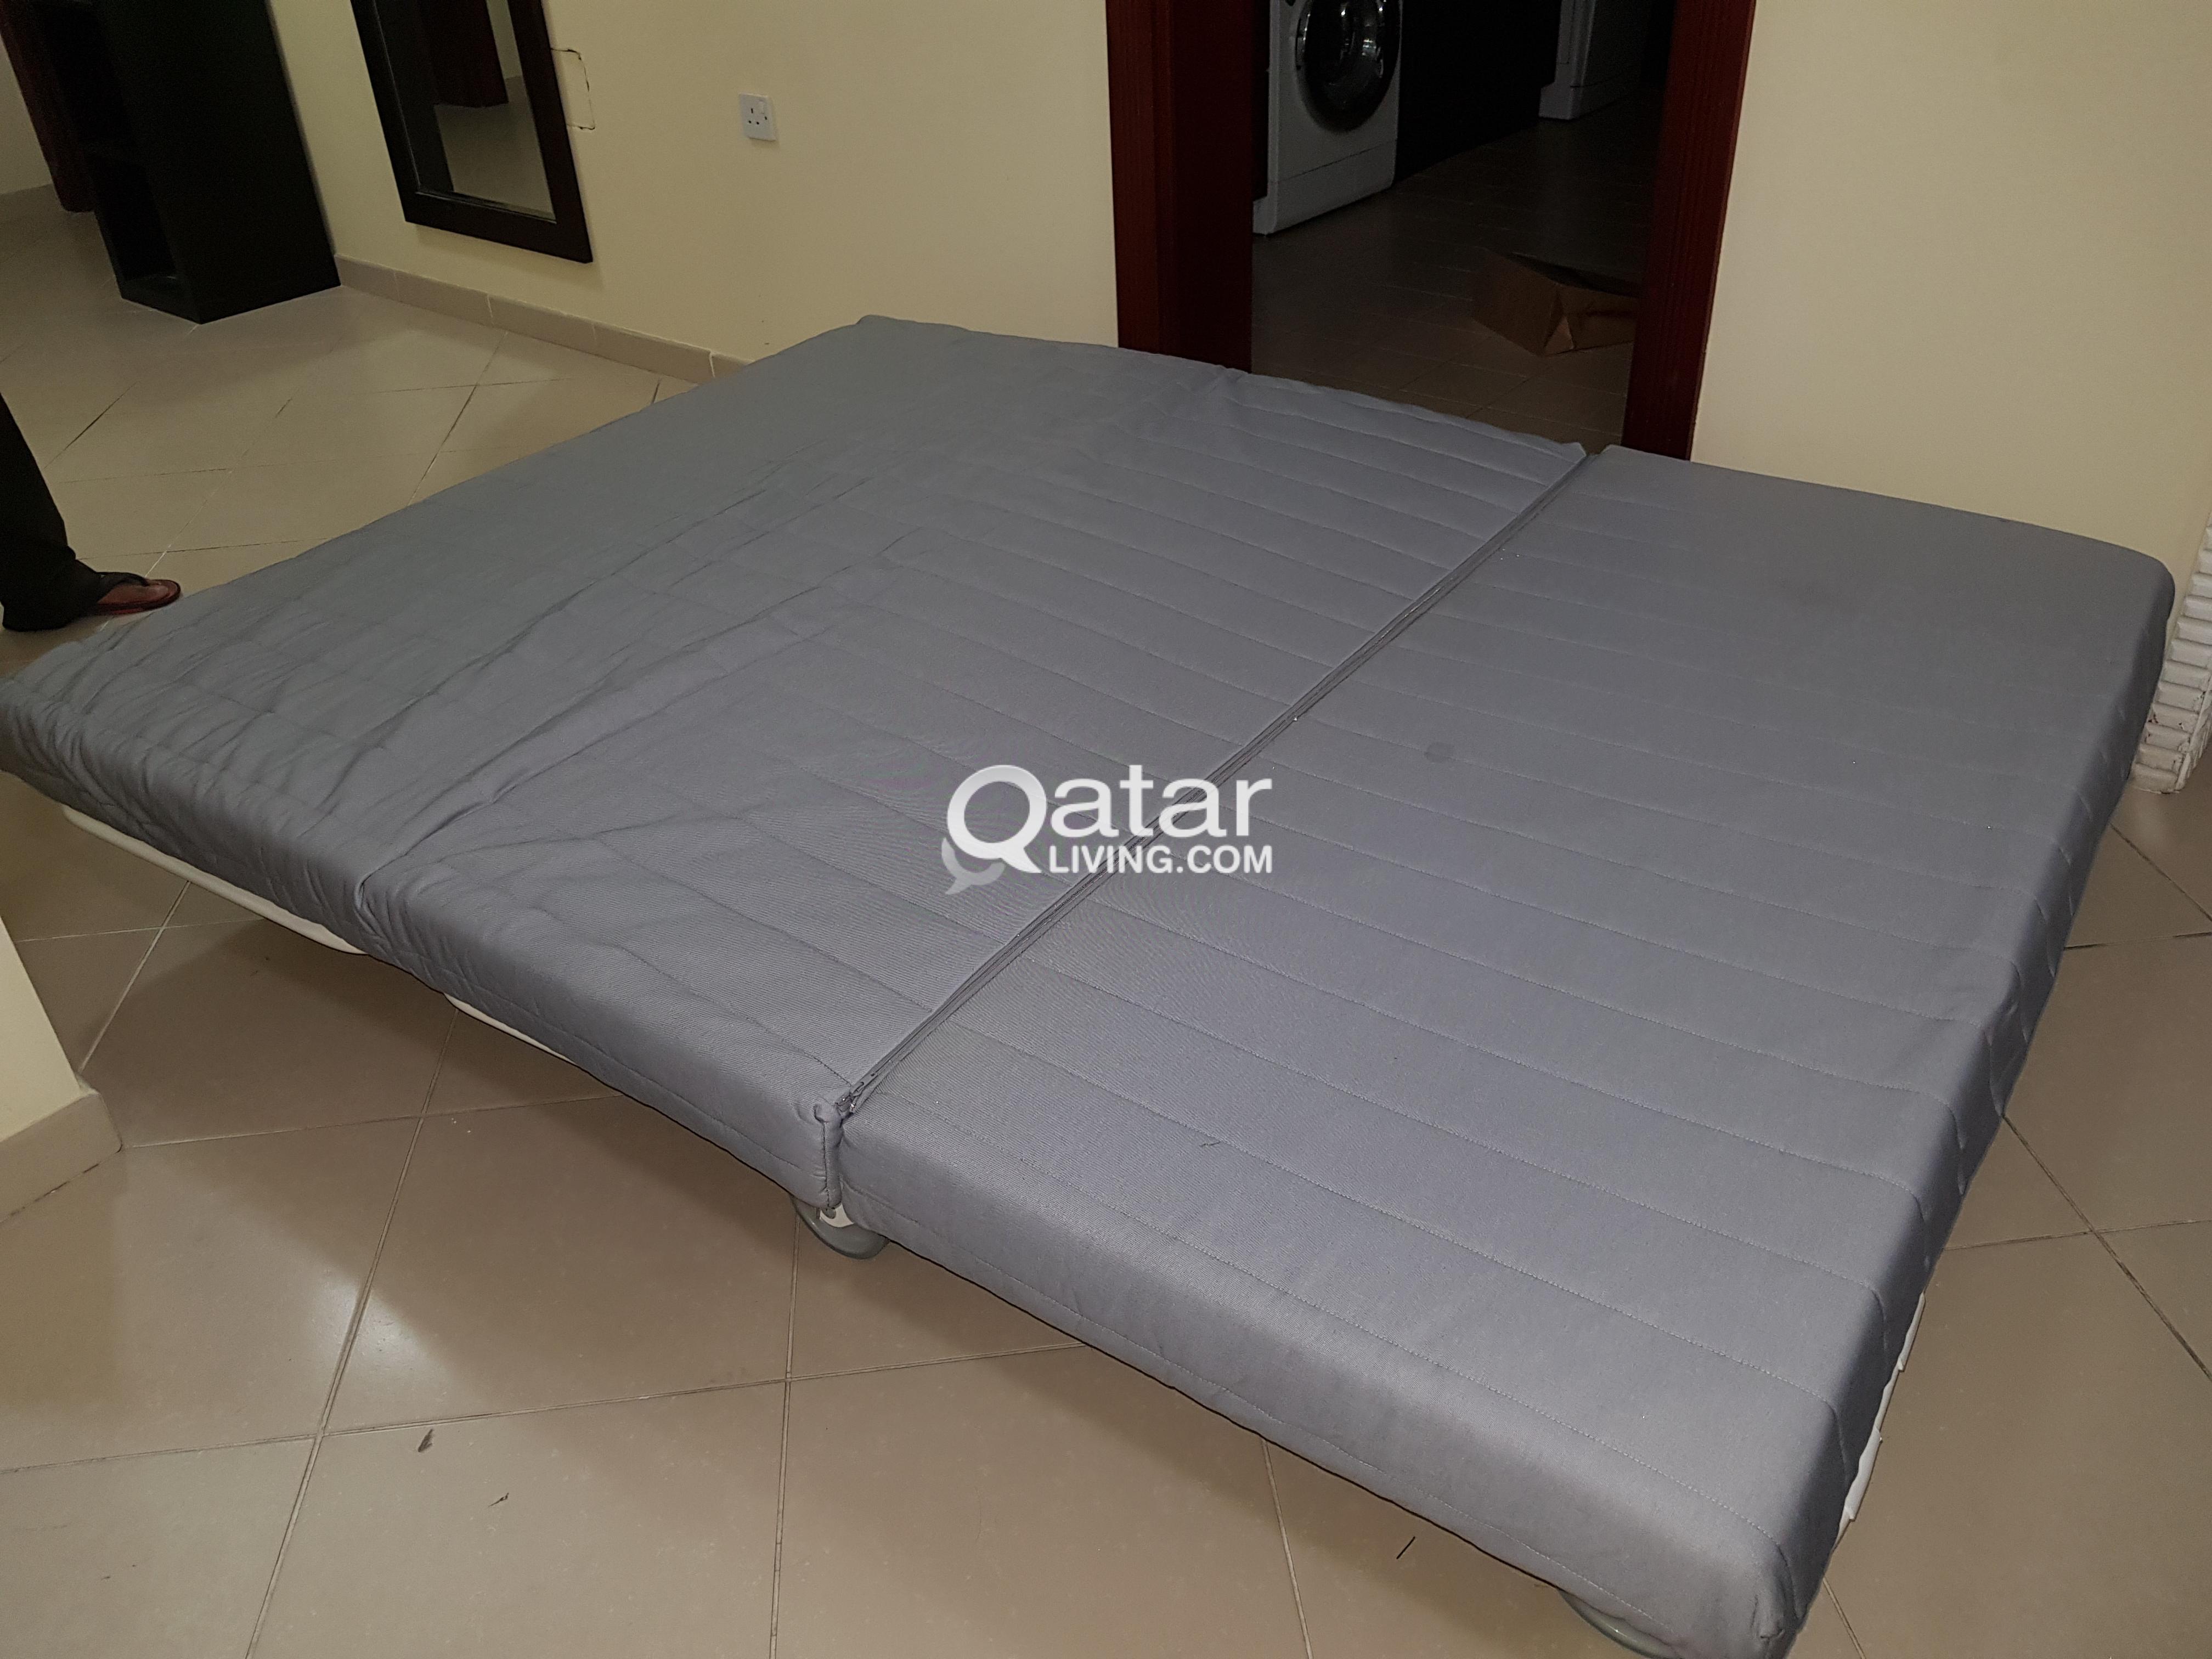 Astonishing Sofa Cum Bed Showcase Tv Table Etc Qatar Living Download Free Architecture Designs Scobabritishbridgeorg